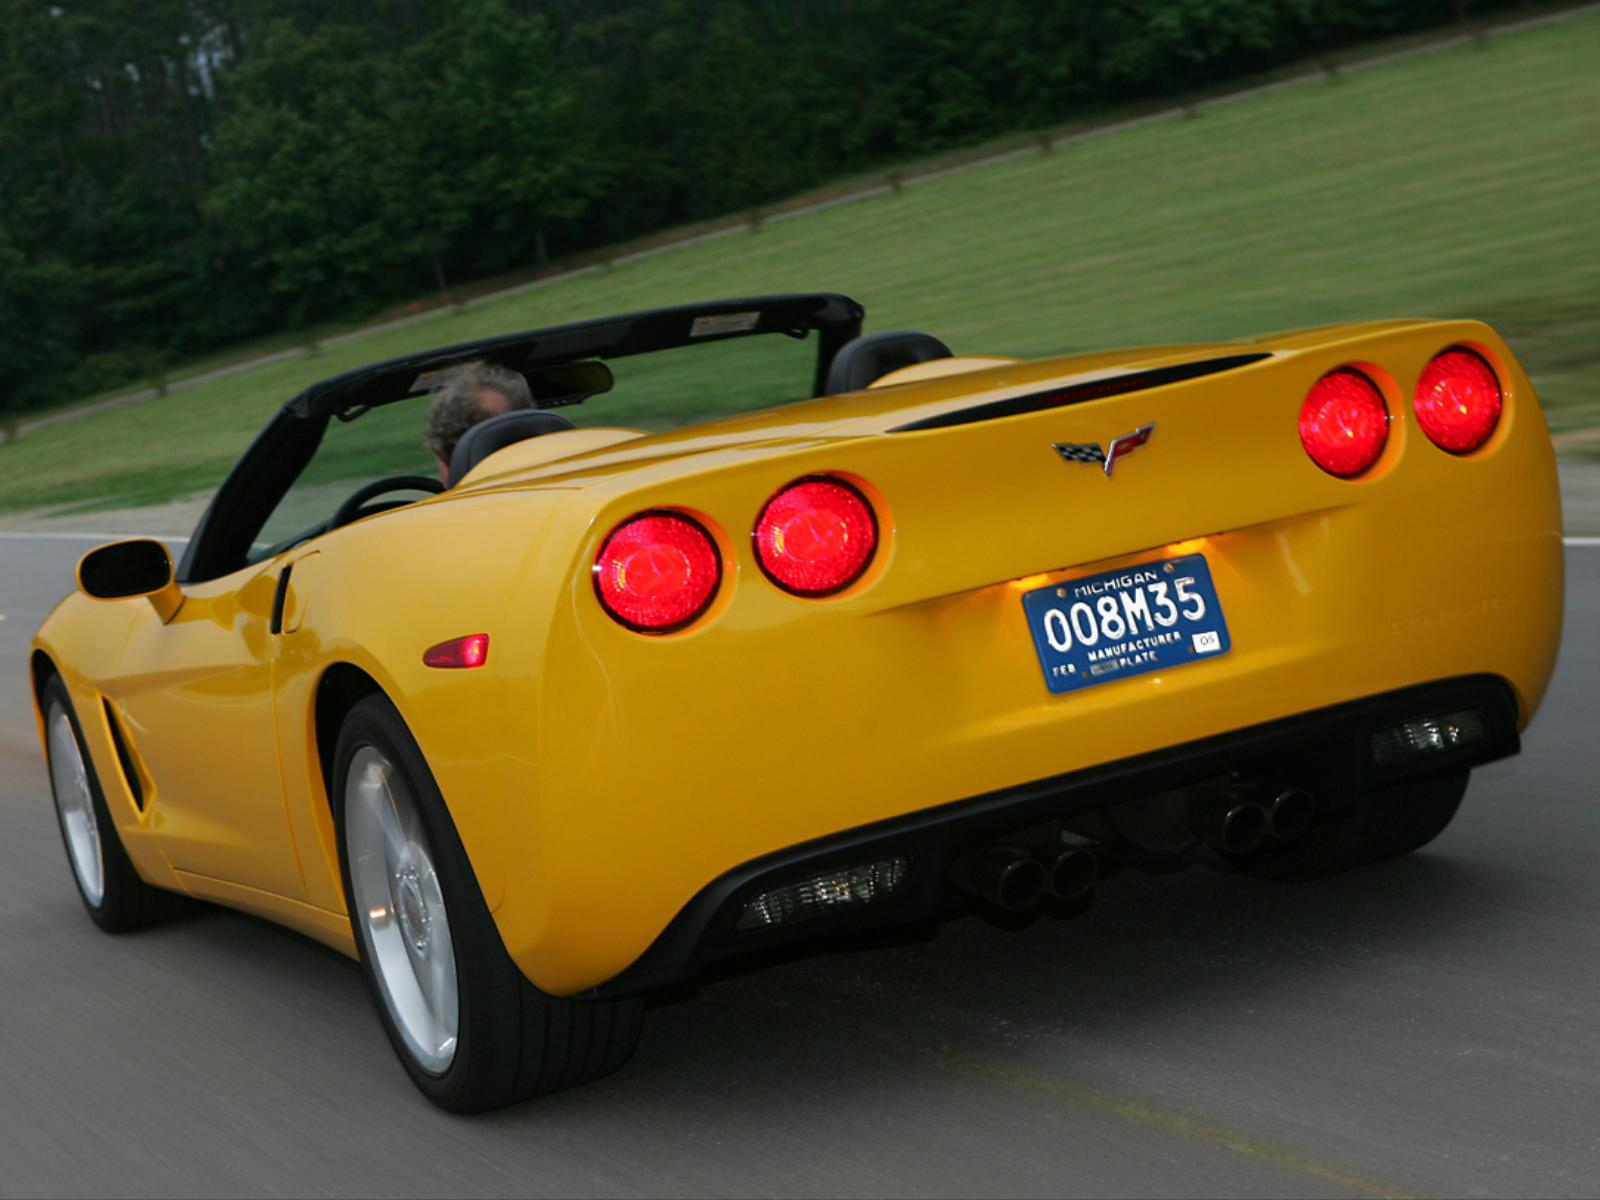 Kelebihan Chevrolet Corvette C6 Harga